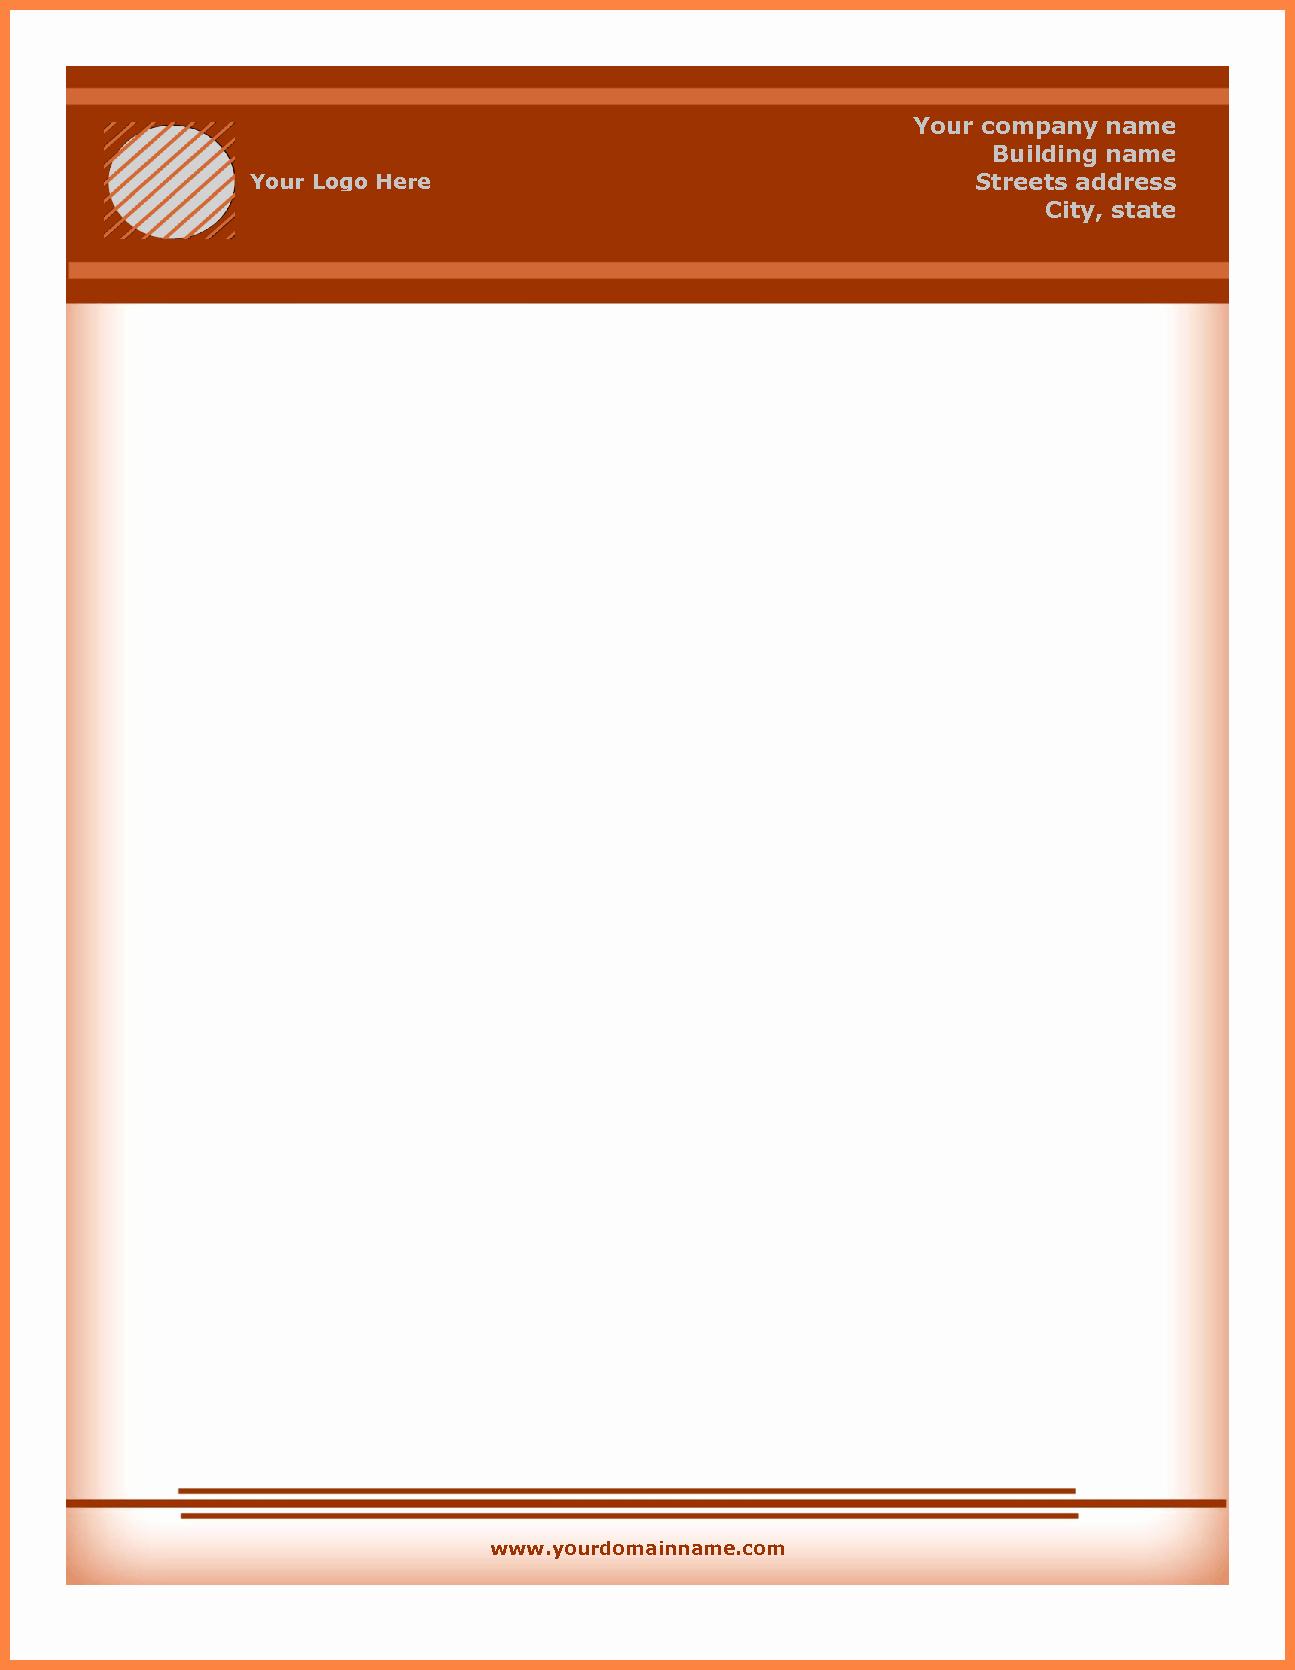 Professional Letterhead Template Free Inspirational 5 Letterhead Templates